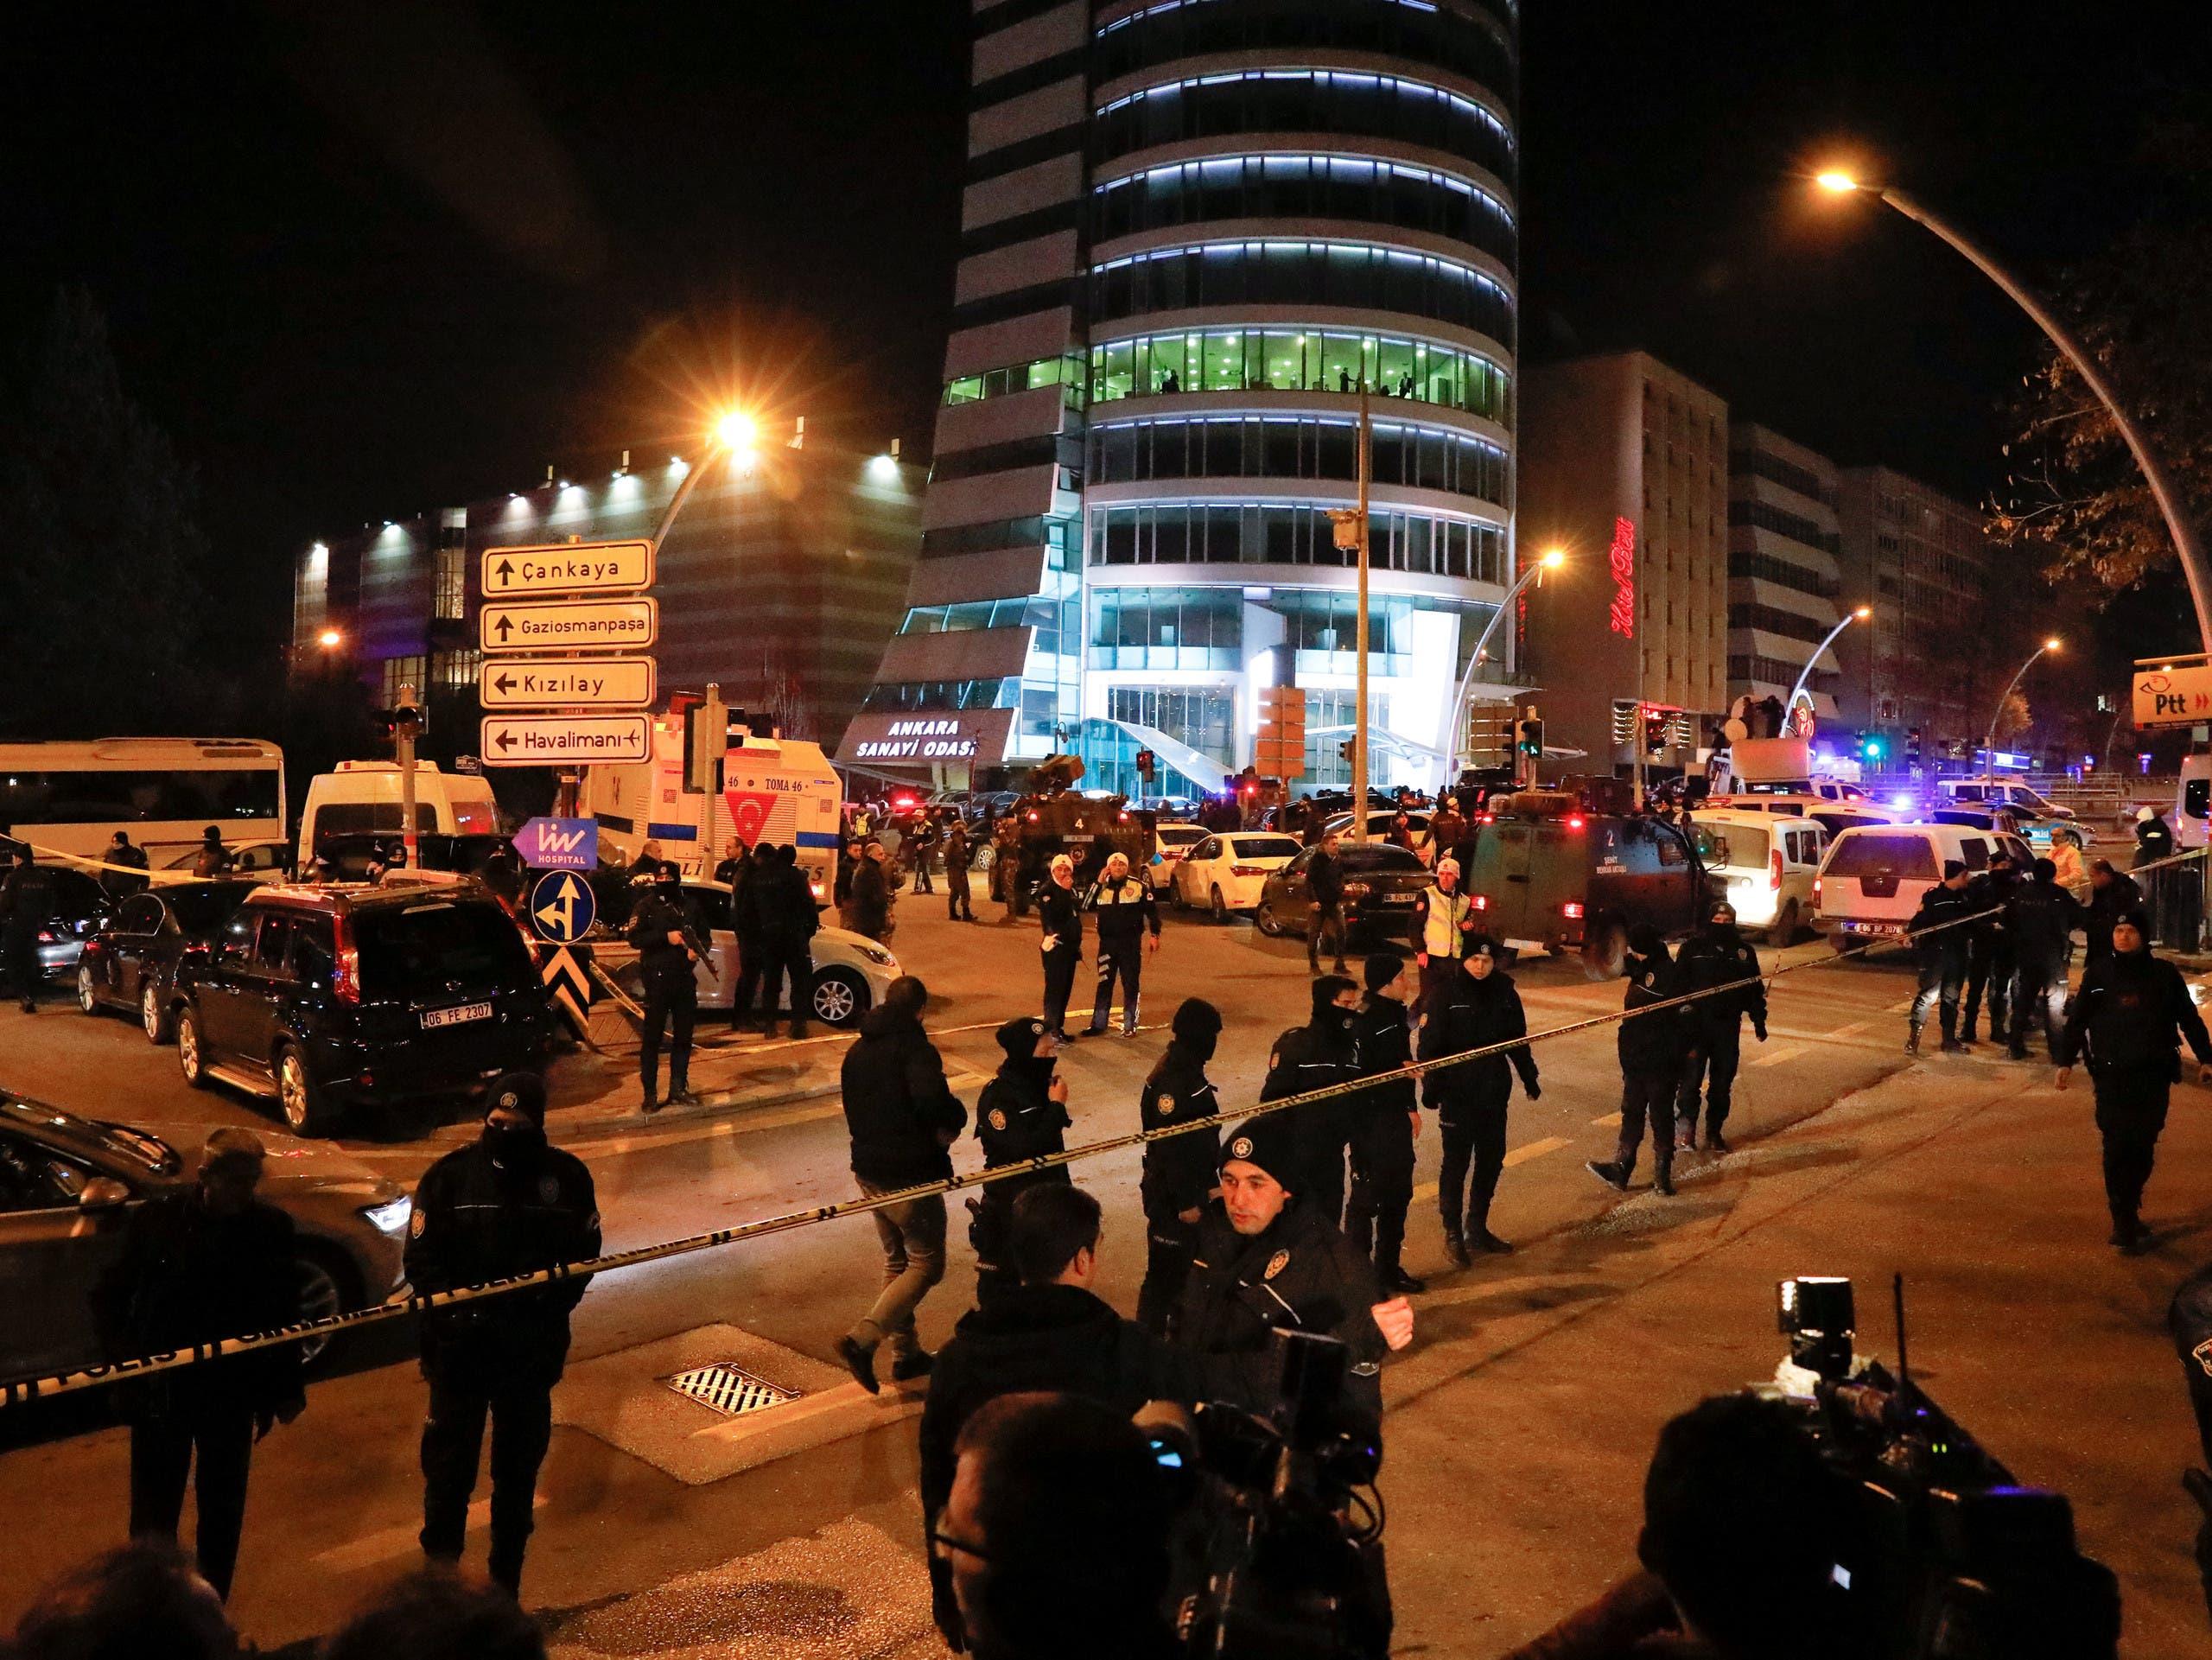 Turkish police secure the area near an art gallery where the Russian Ambassador to Turkey Andrei Karlov was shot in Ankara, Turkey, December 19, 2016.  AFP